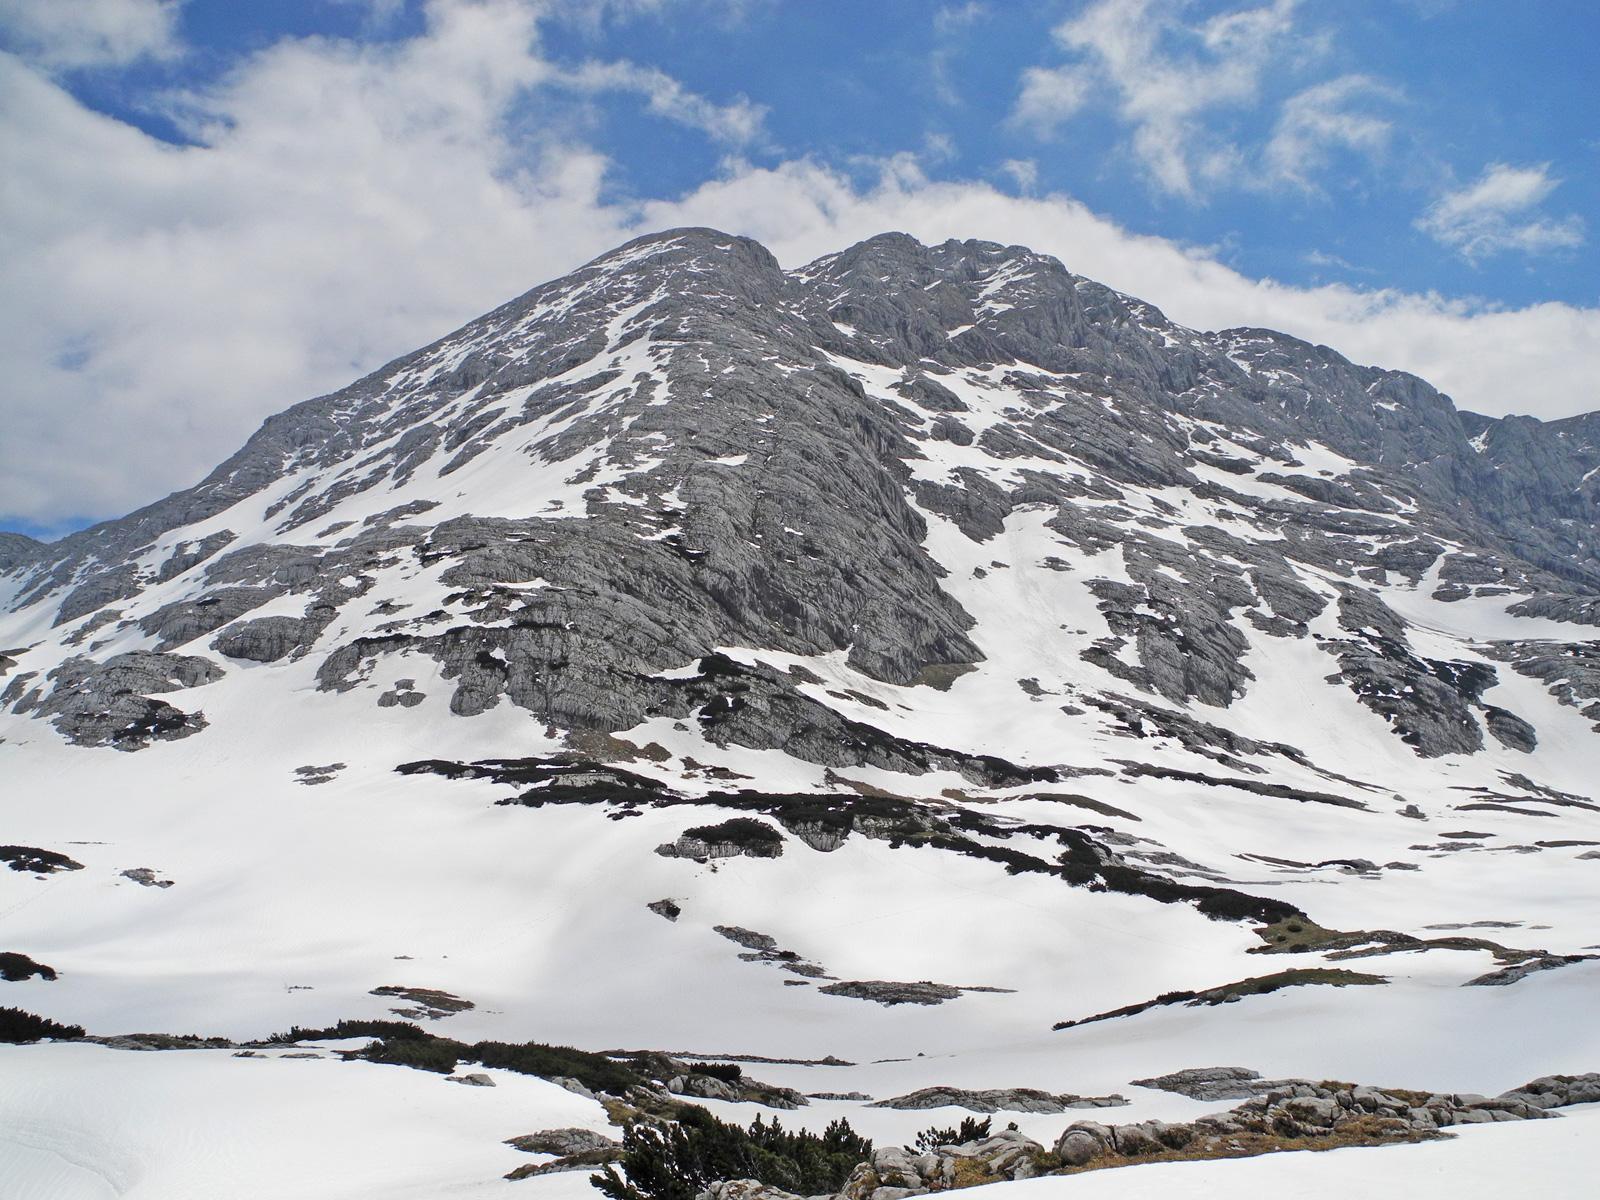 Etappe 24: Prielschutzhaus – Pühringerhütte